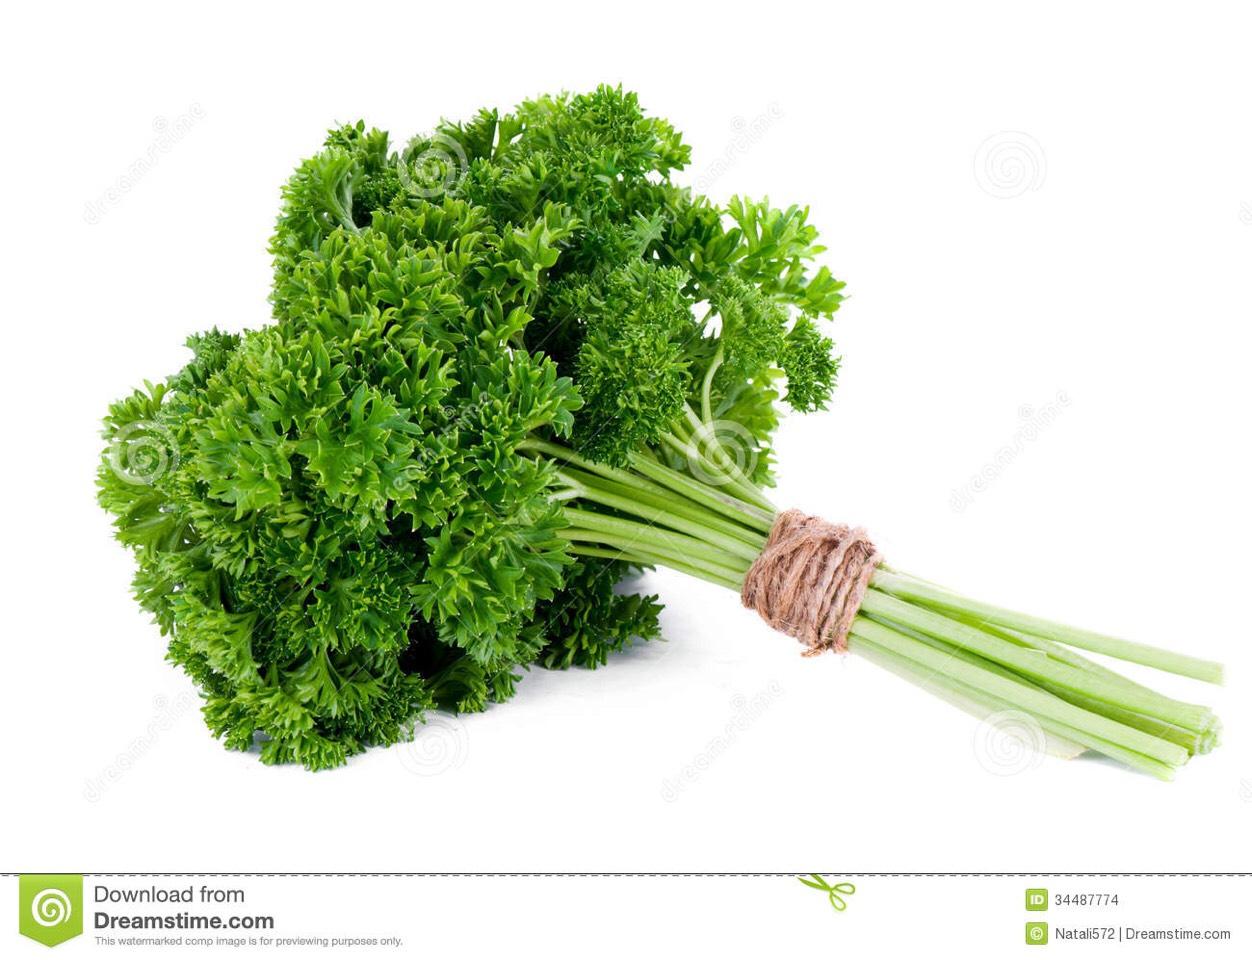 2 tbsp fresh parsley